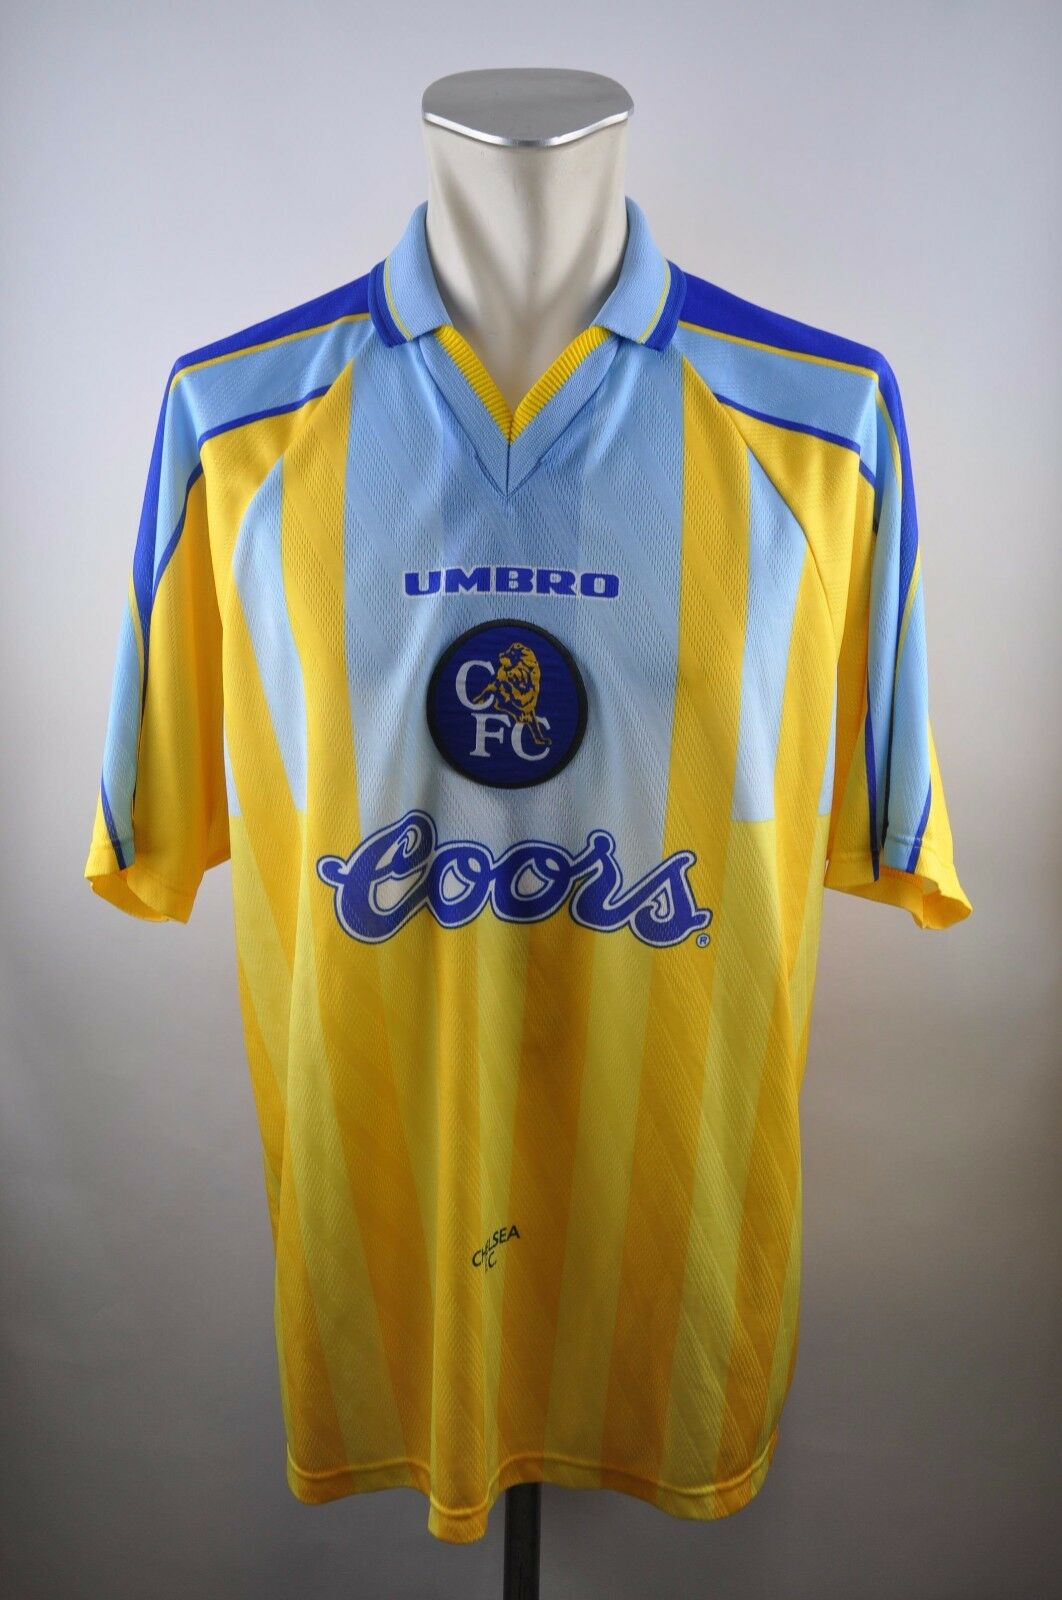 Chelsea London Trikot 1996-1997 Away XXL Umbro Coors Coors Umbro vintage 90er shirt Jersey 5e3c22